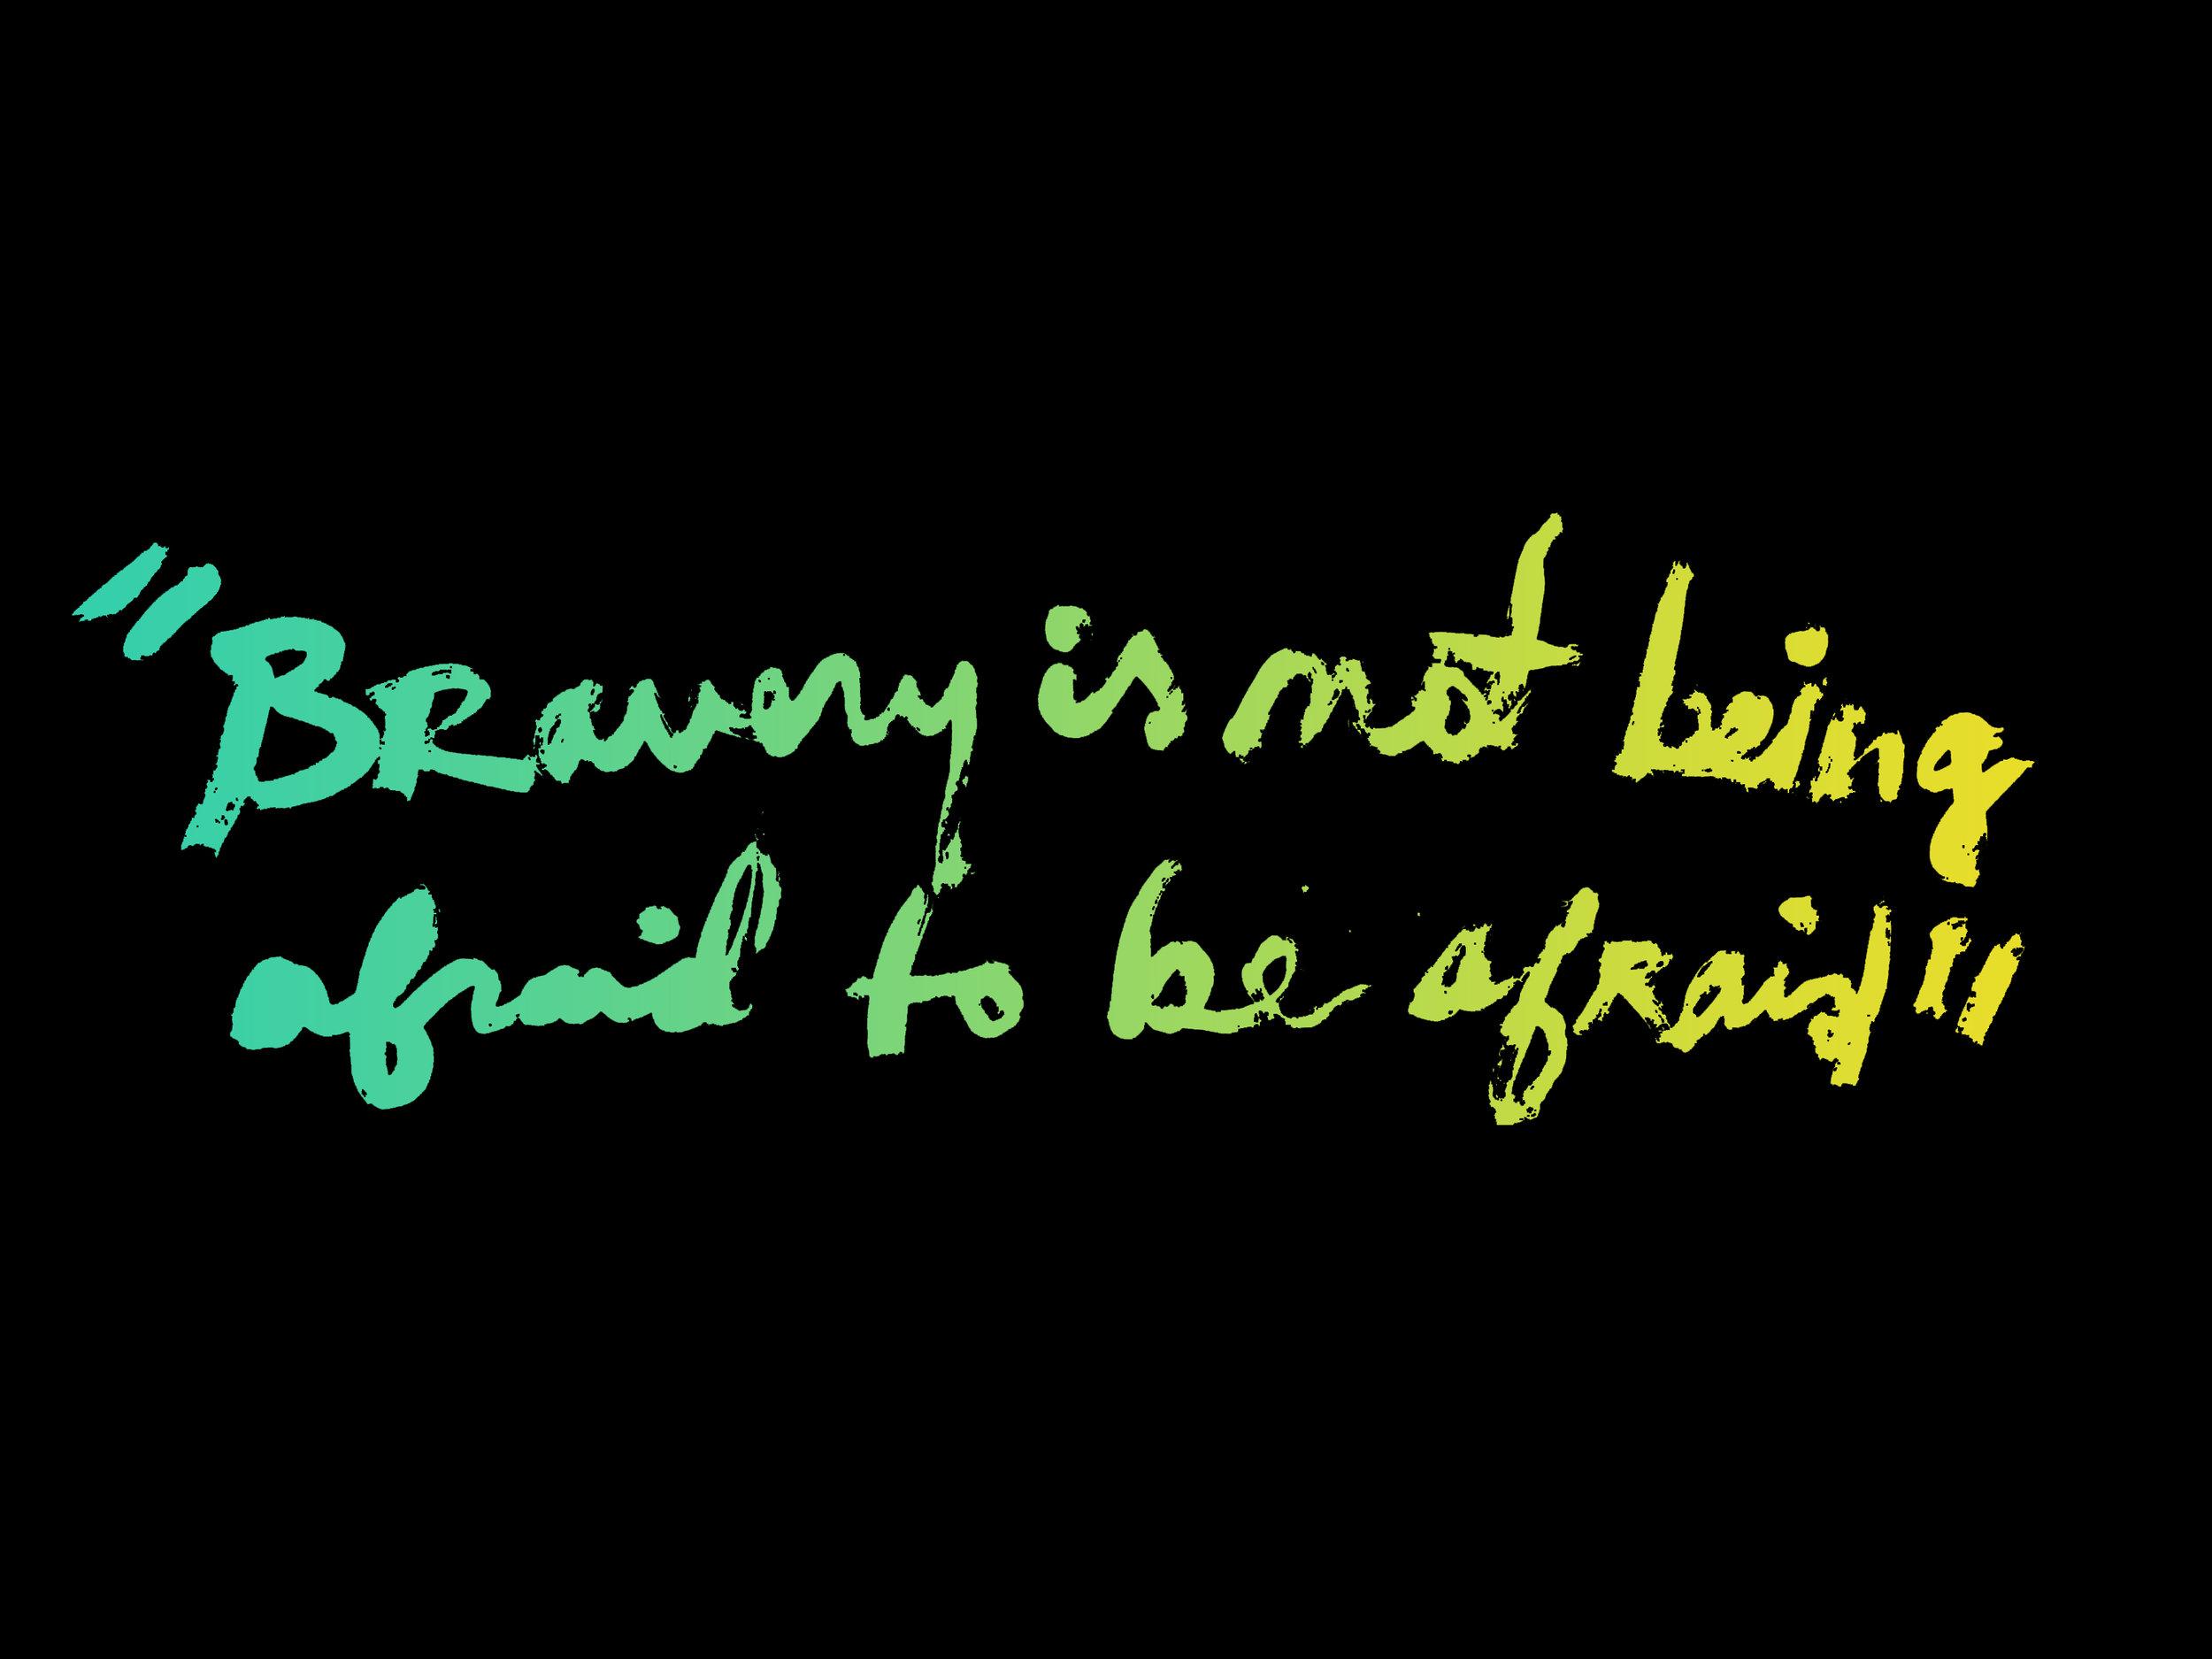 bravery quote.jpg